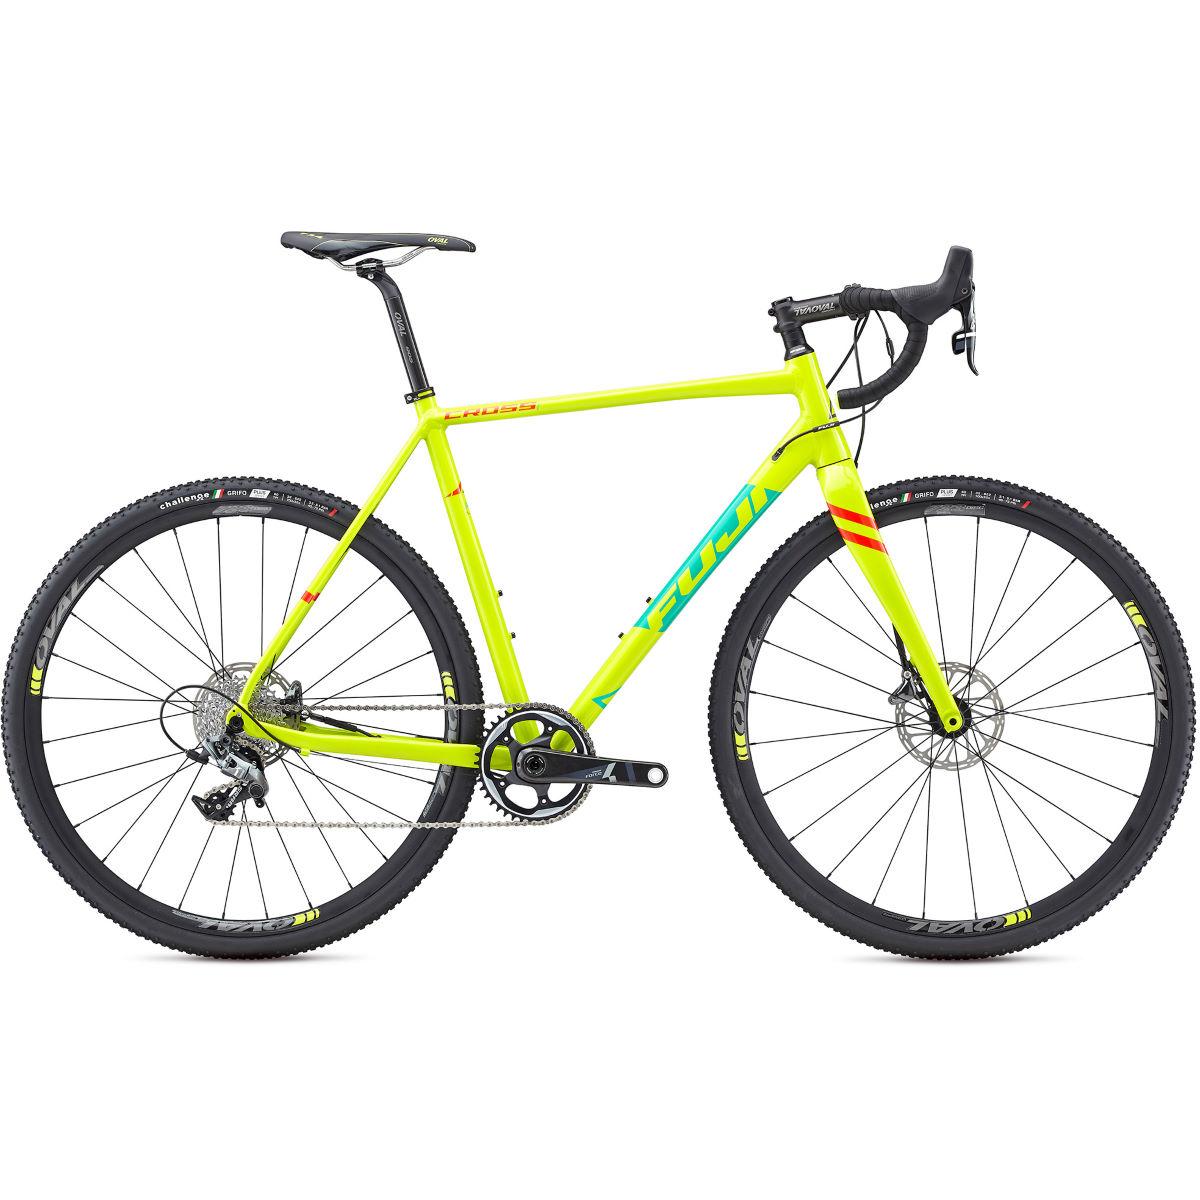 Fuji Cross 1.1 2017 Bikes